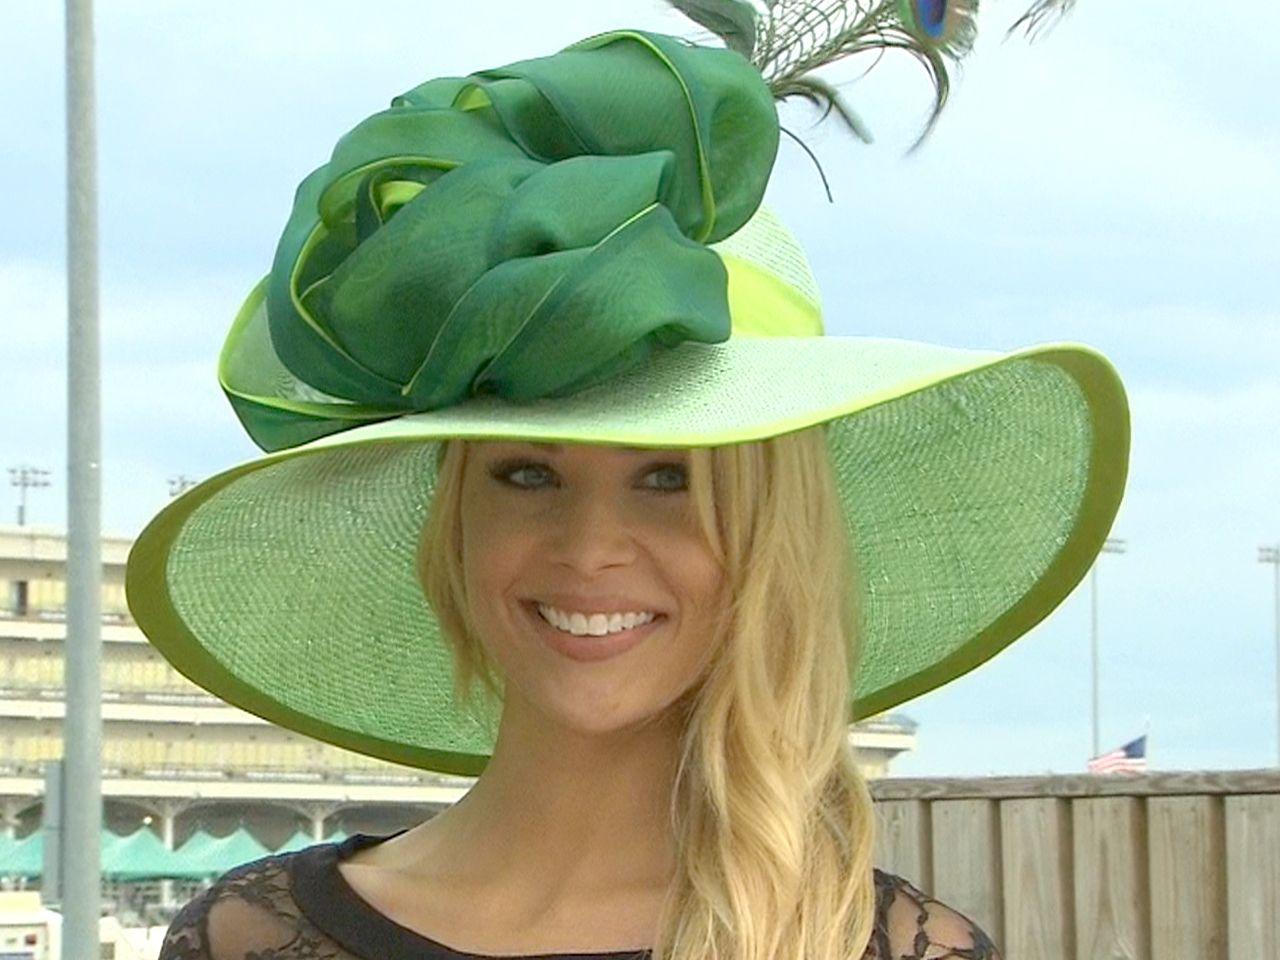 6 Fun And Festive Kentucky Derby Hat Styles Derby Hats Kentucky Derby Hat Kentucky Derby Hats